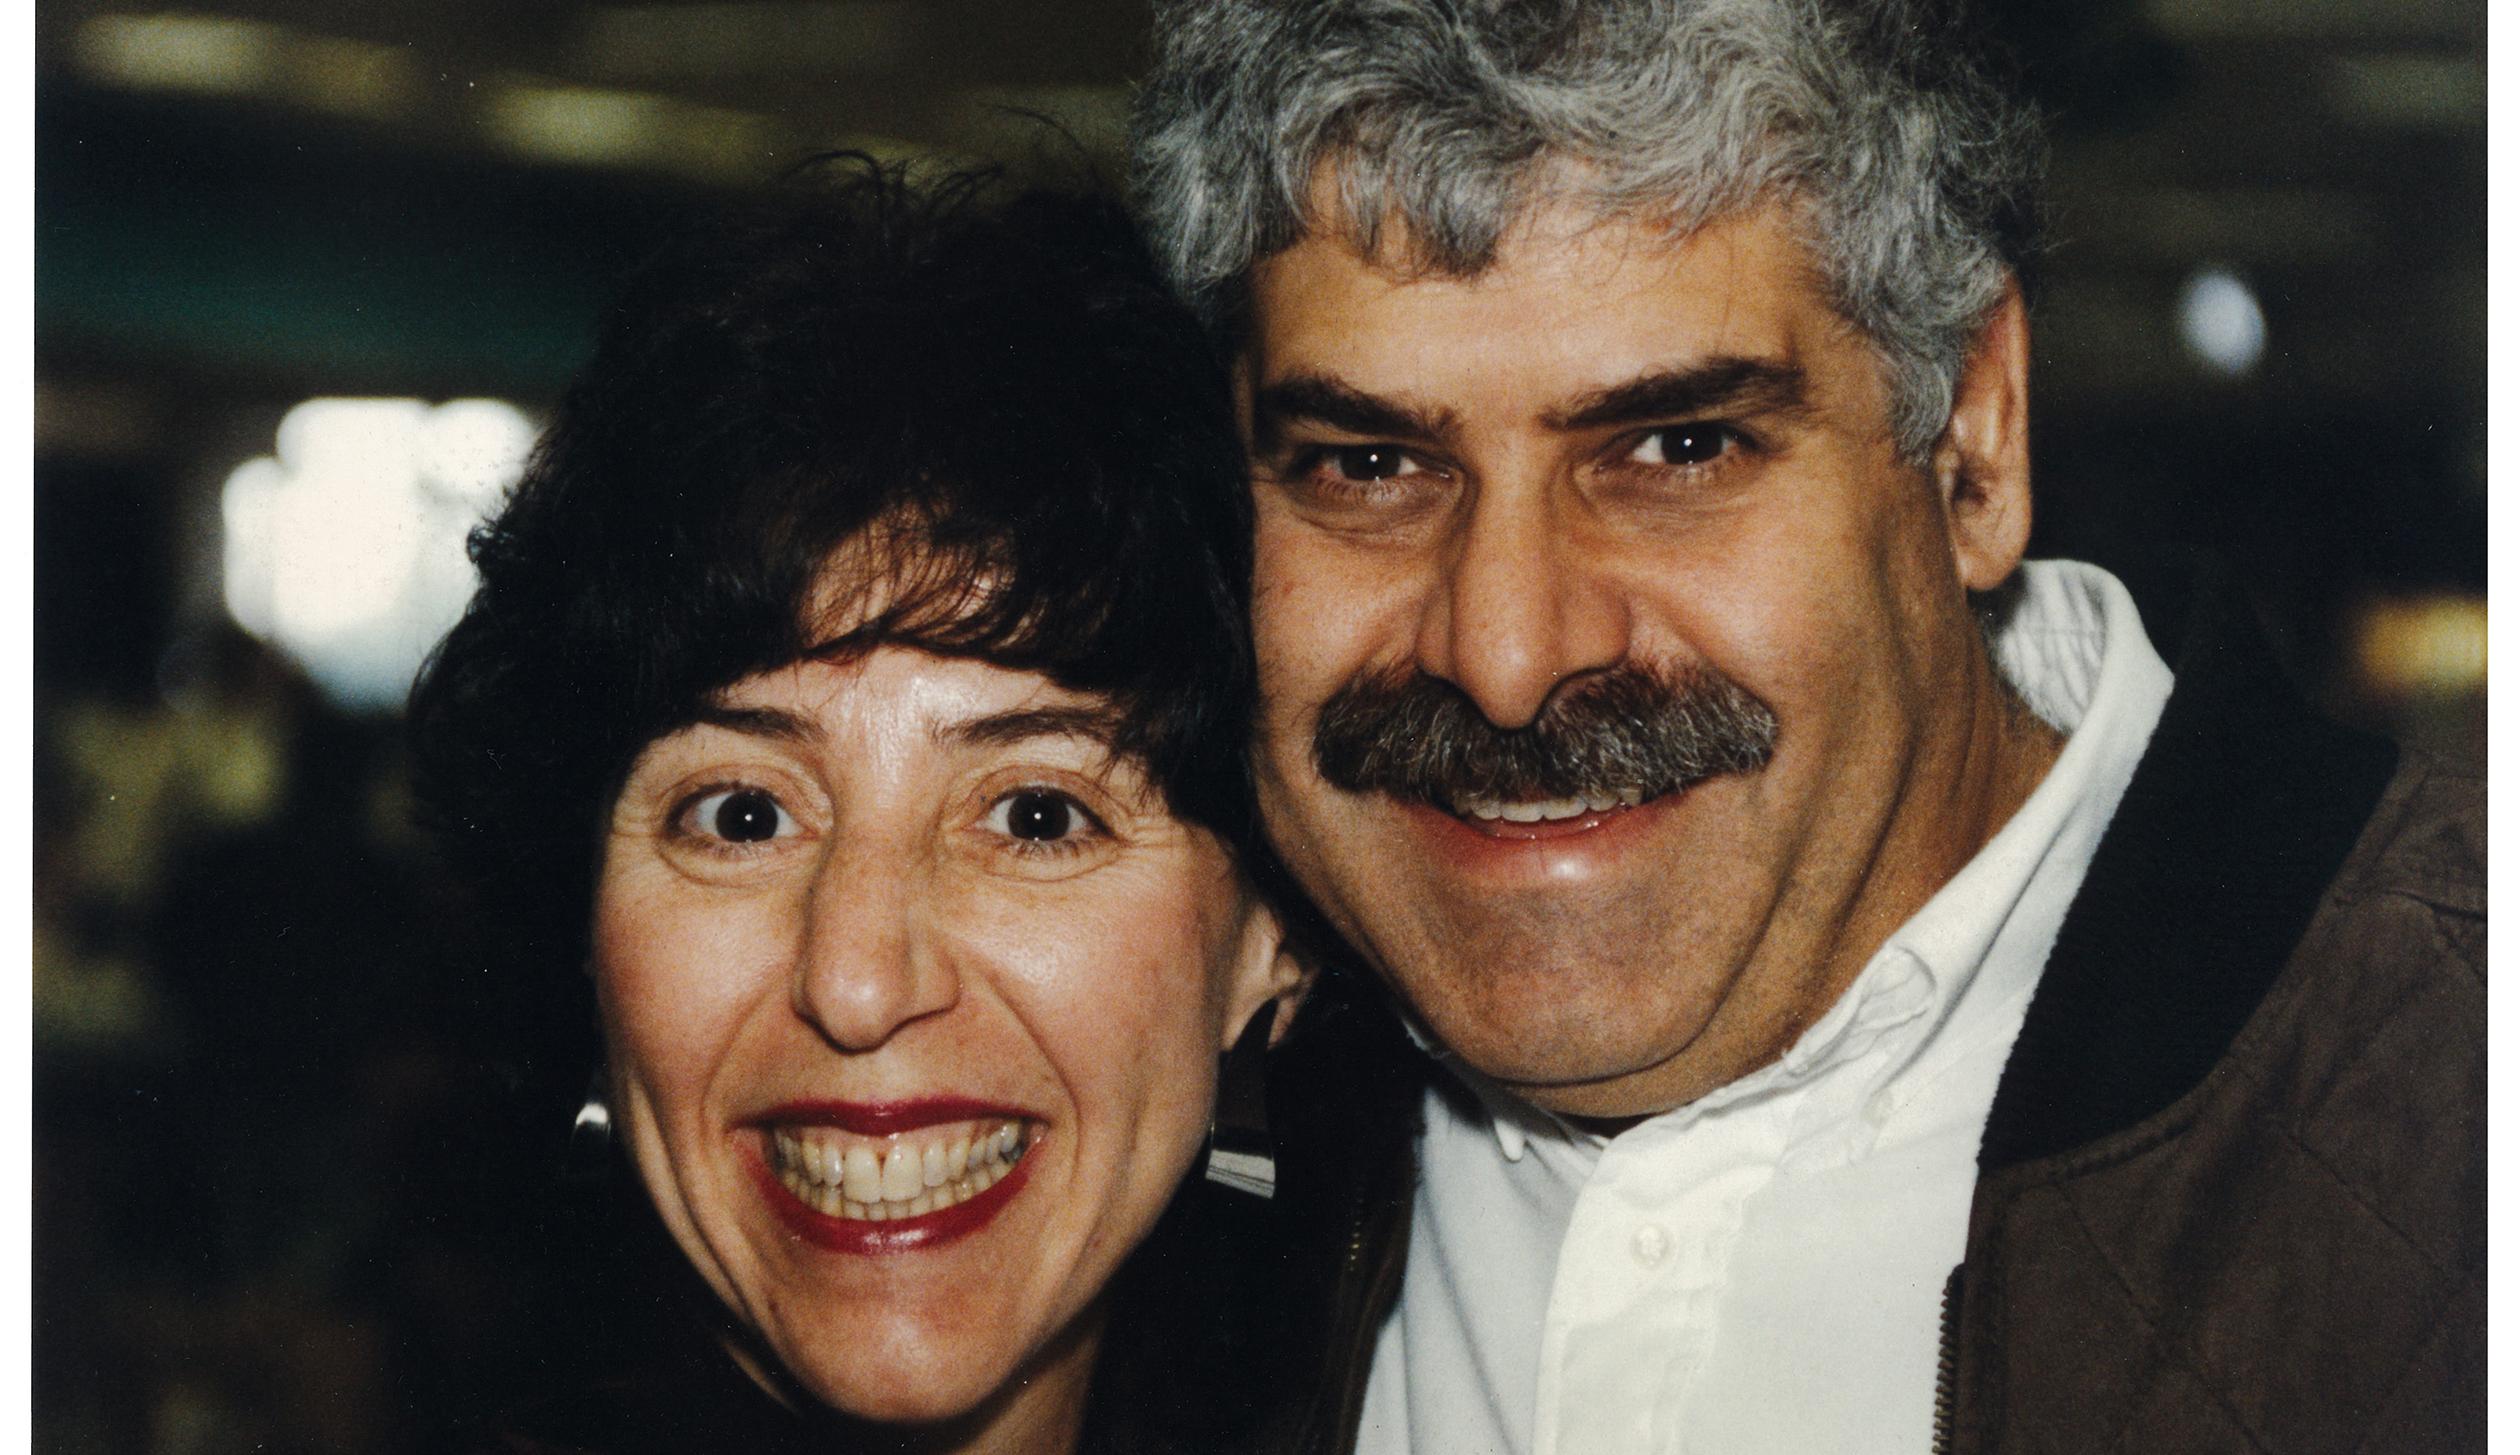 Ora Pescovitz and her late husband, Mark.